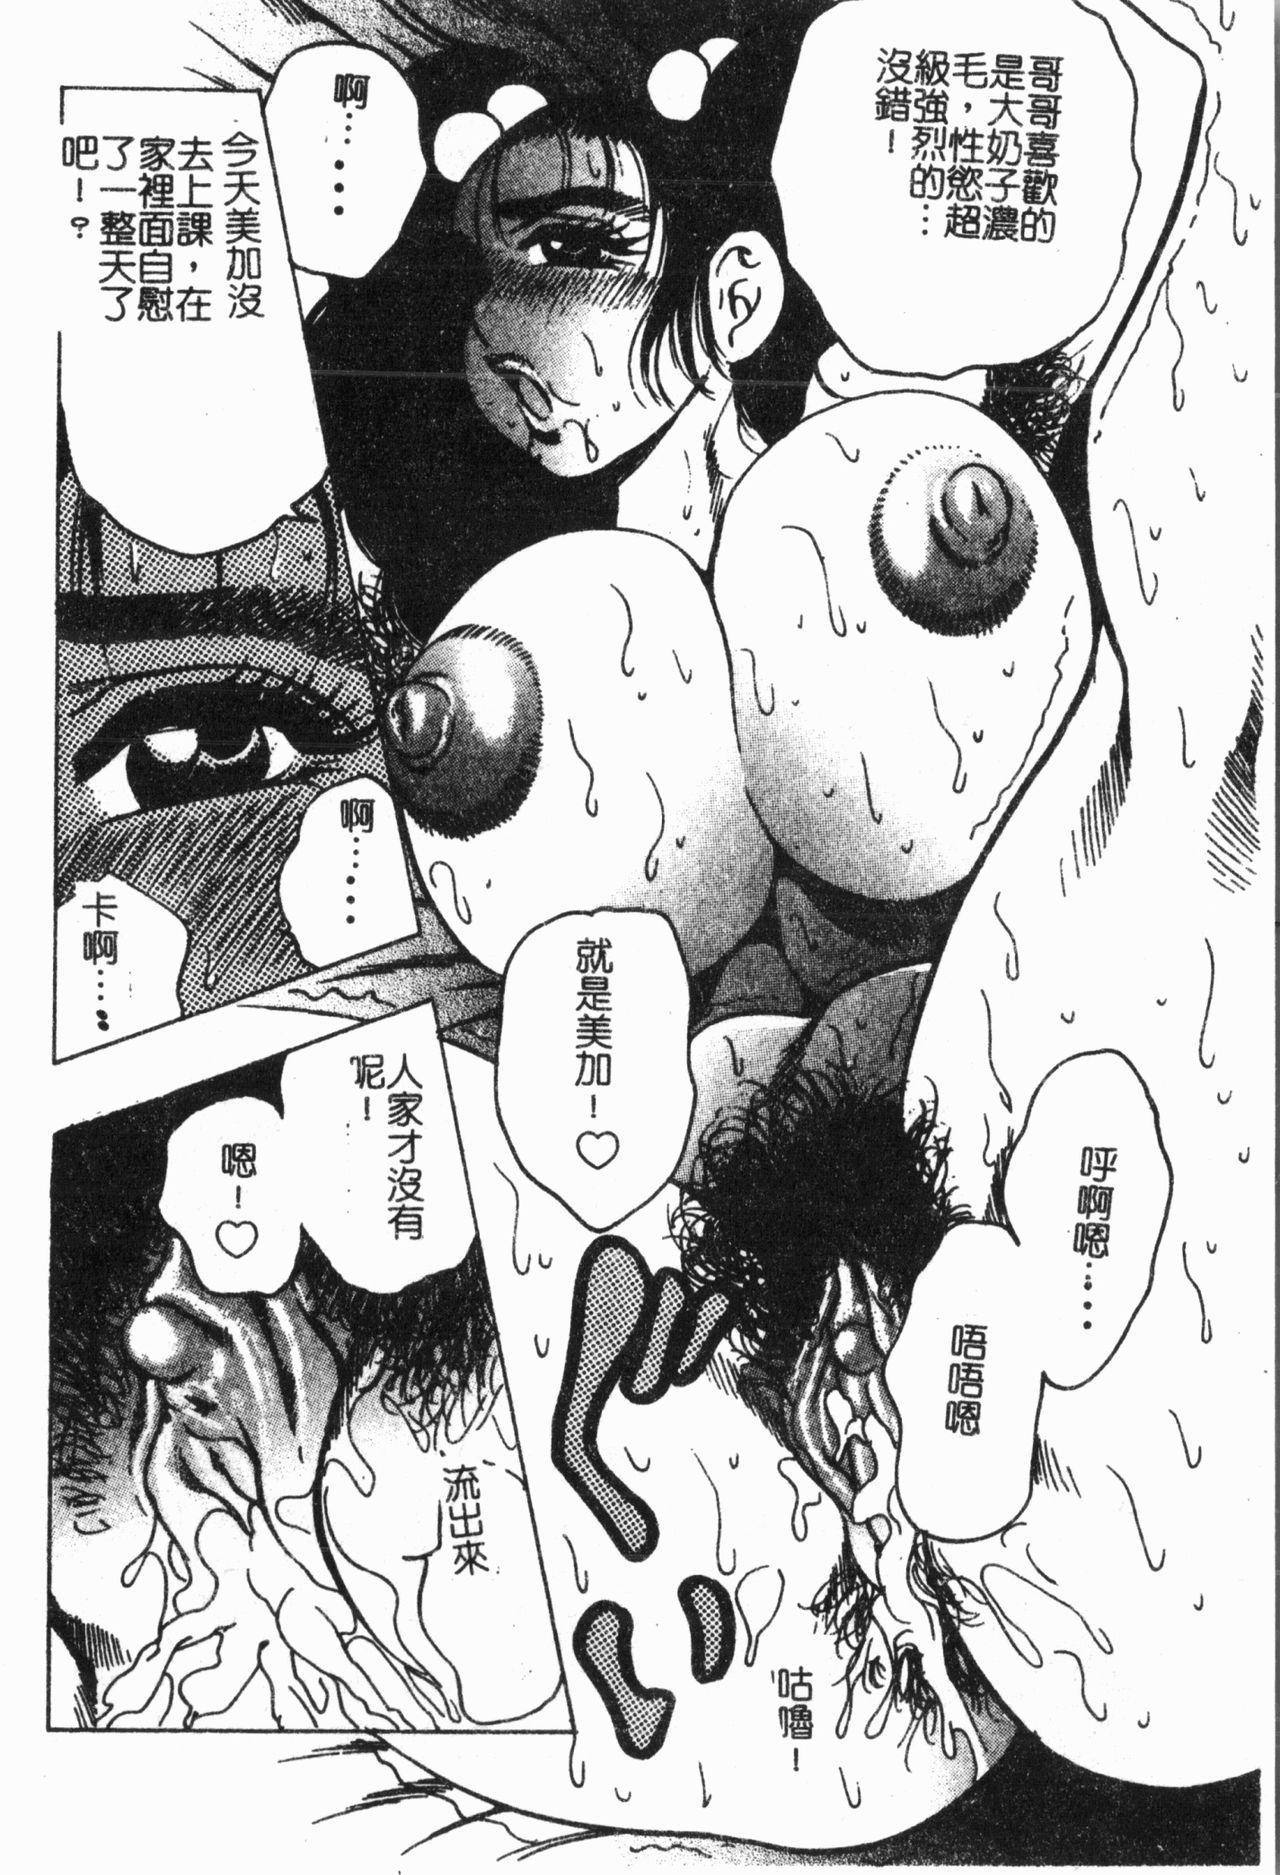 Imouto Koishi 6 126